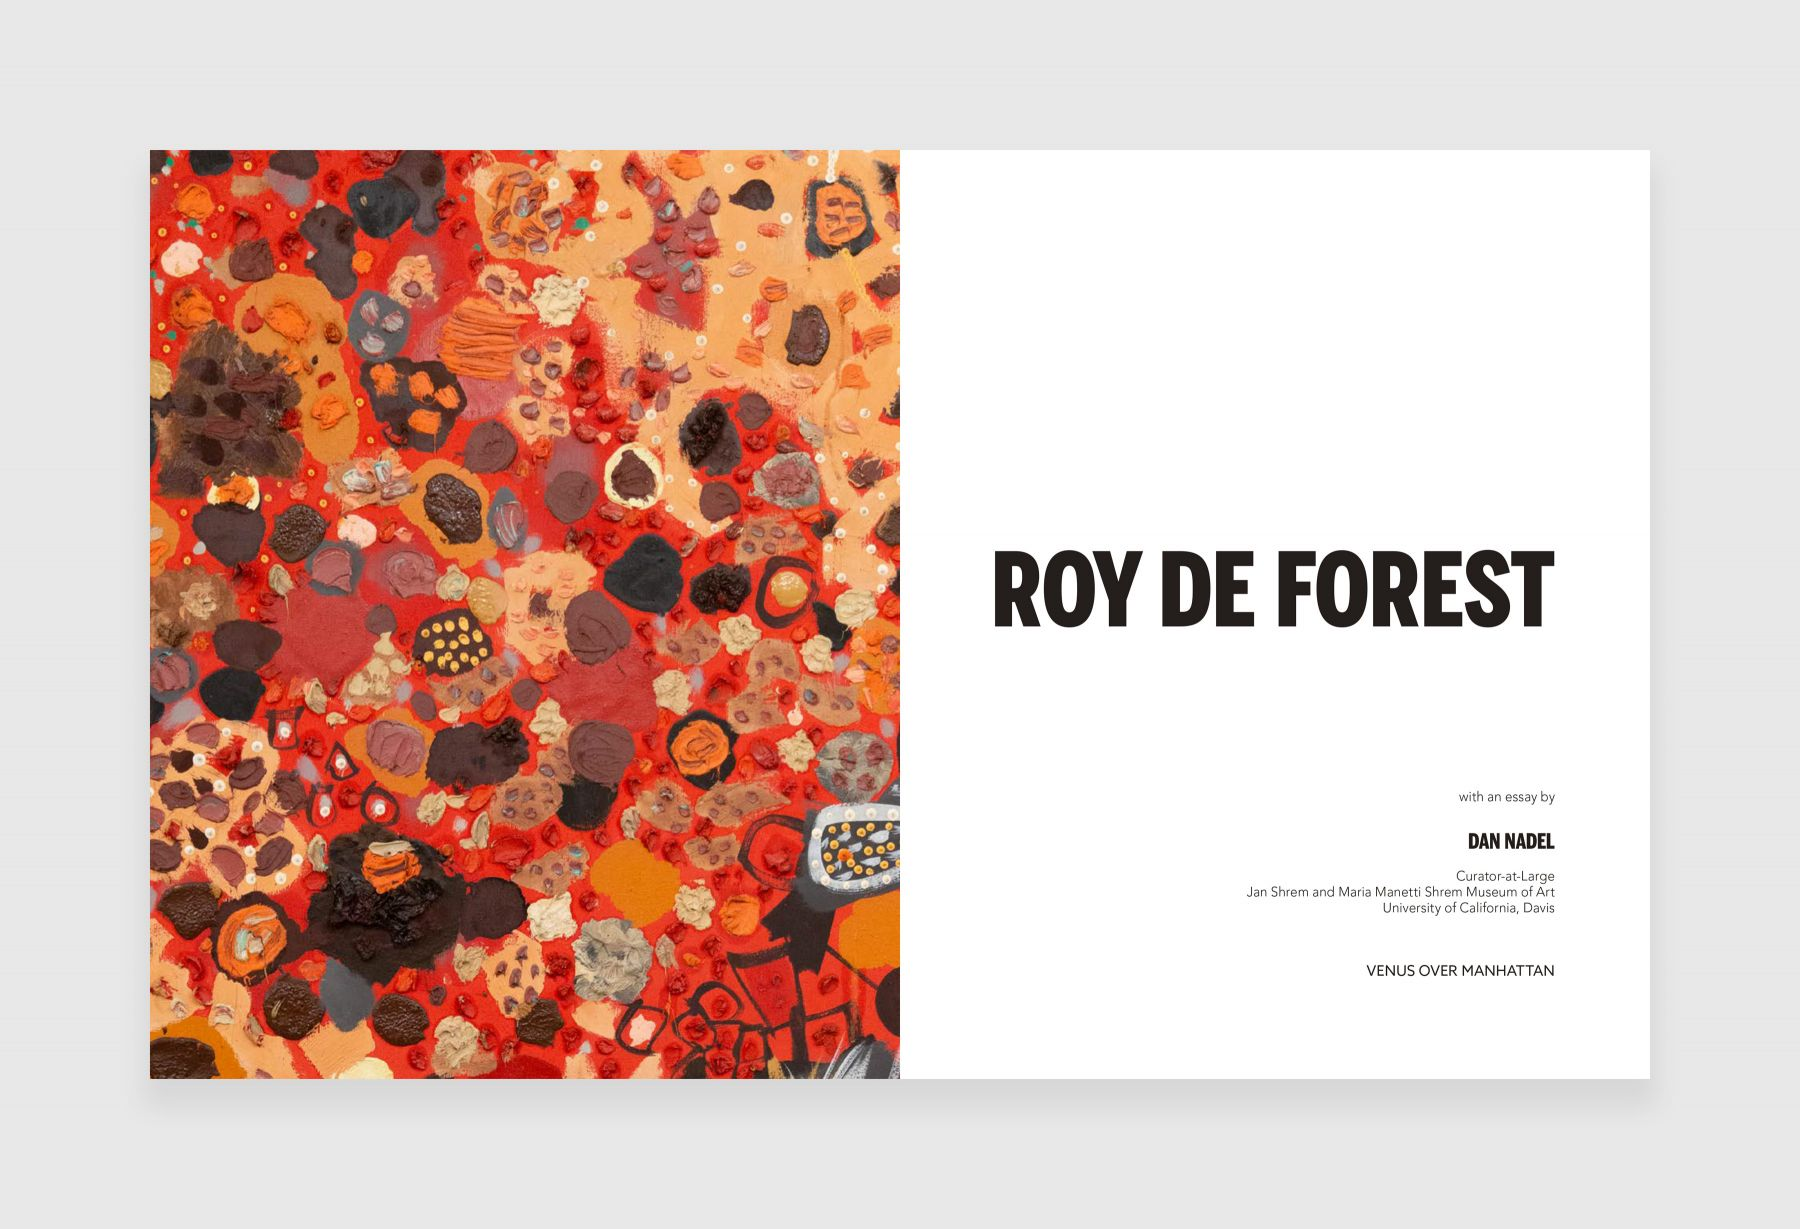 Catalogue Description 1